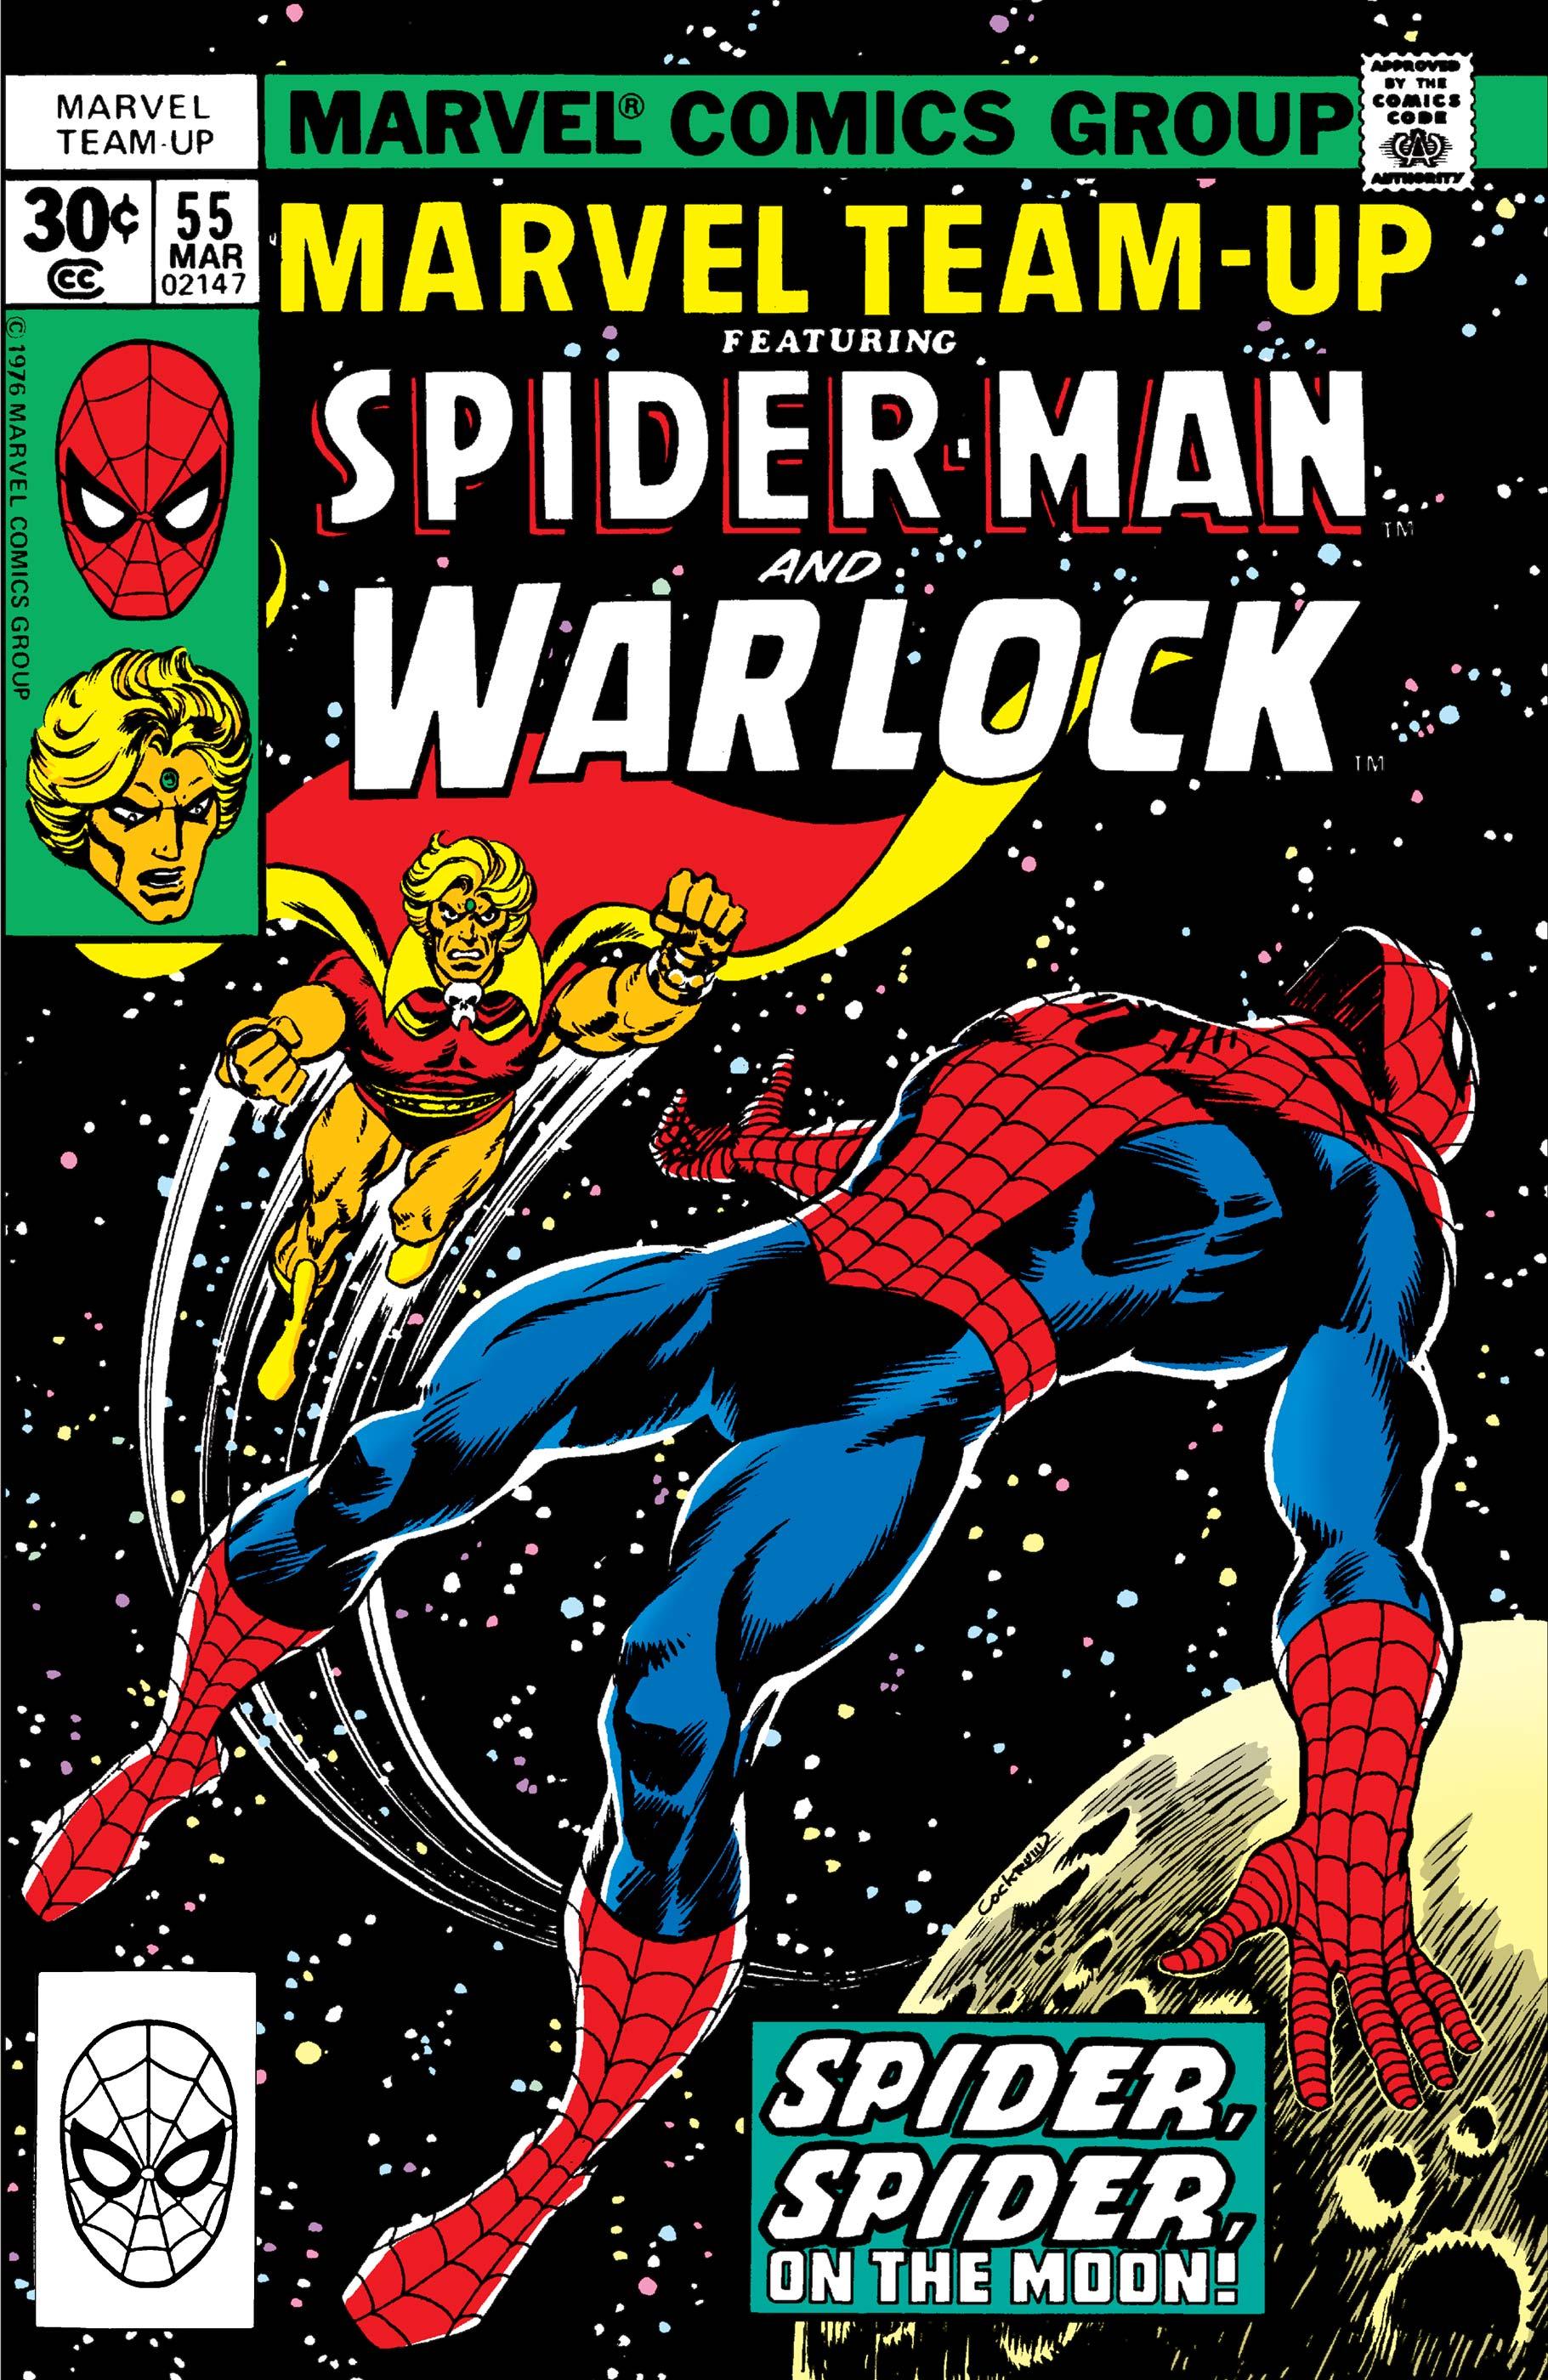 Marvel Team-Up (1972) #55